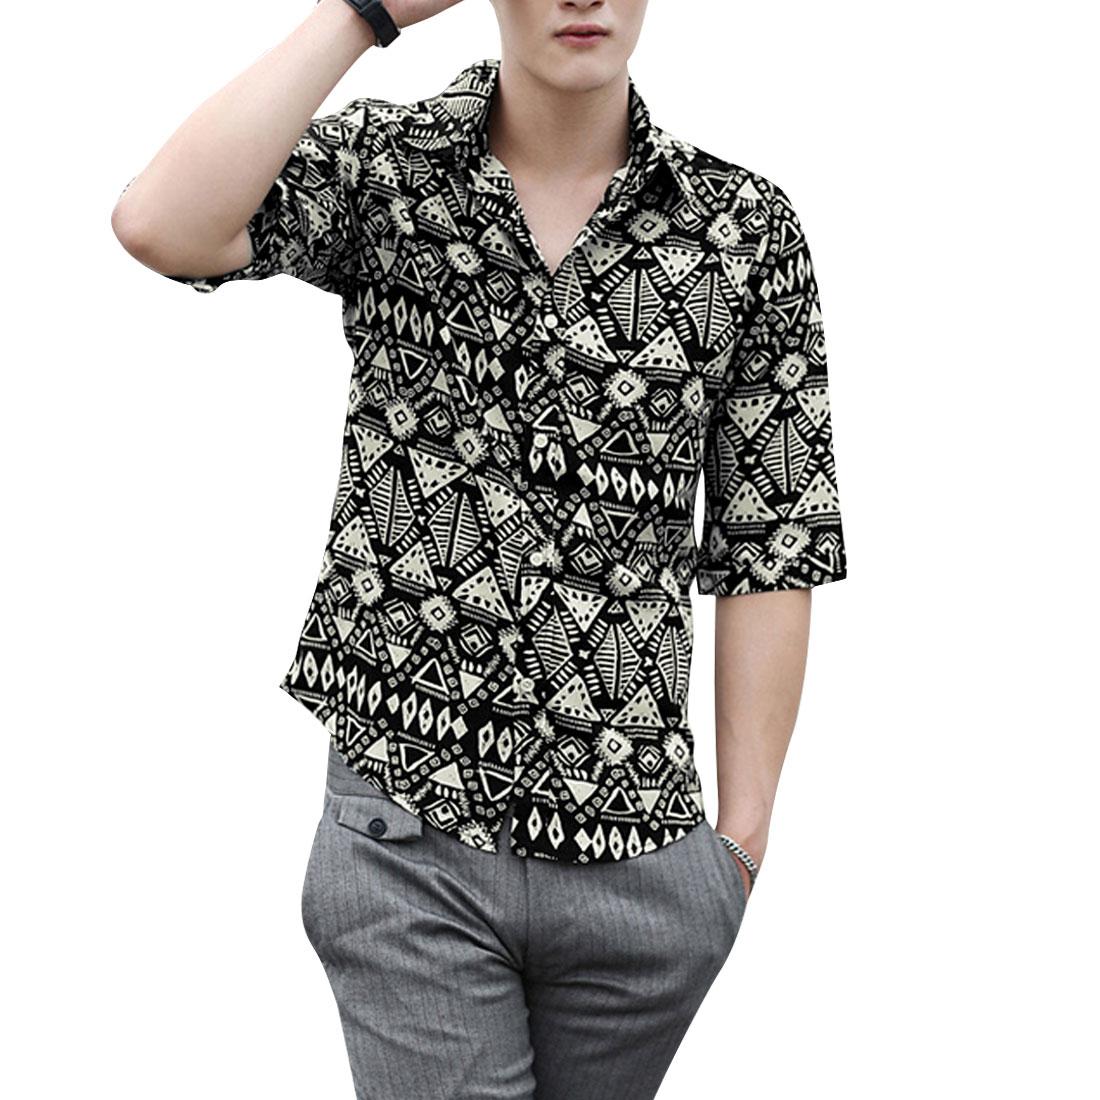 Men Half Length Sleeve Geometric Prints Buttoned Shirt Beige Black M